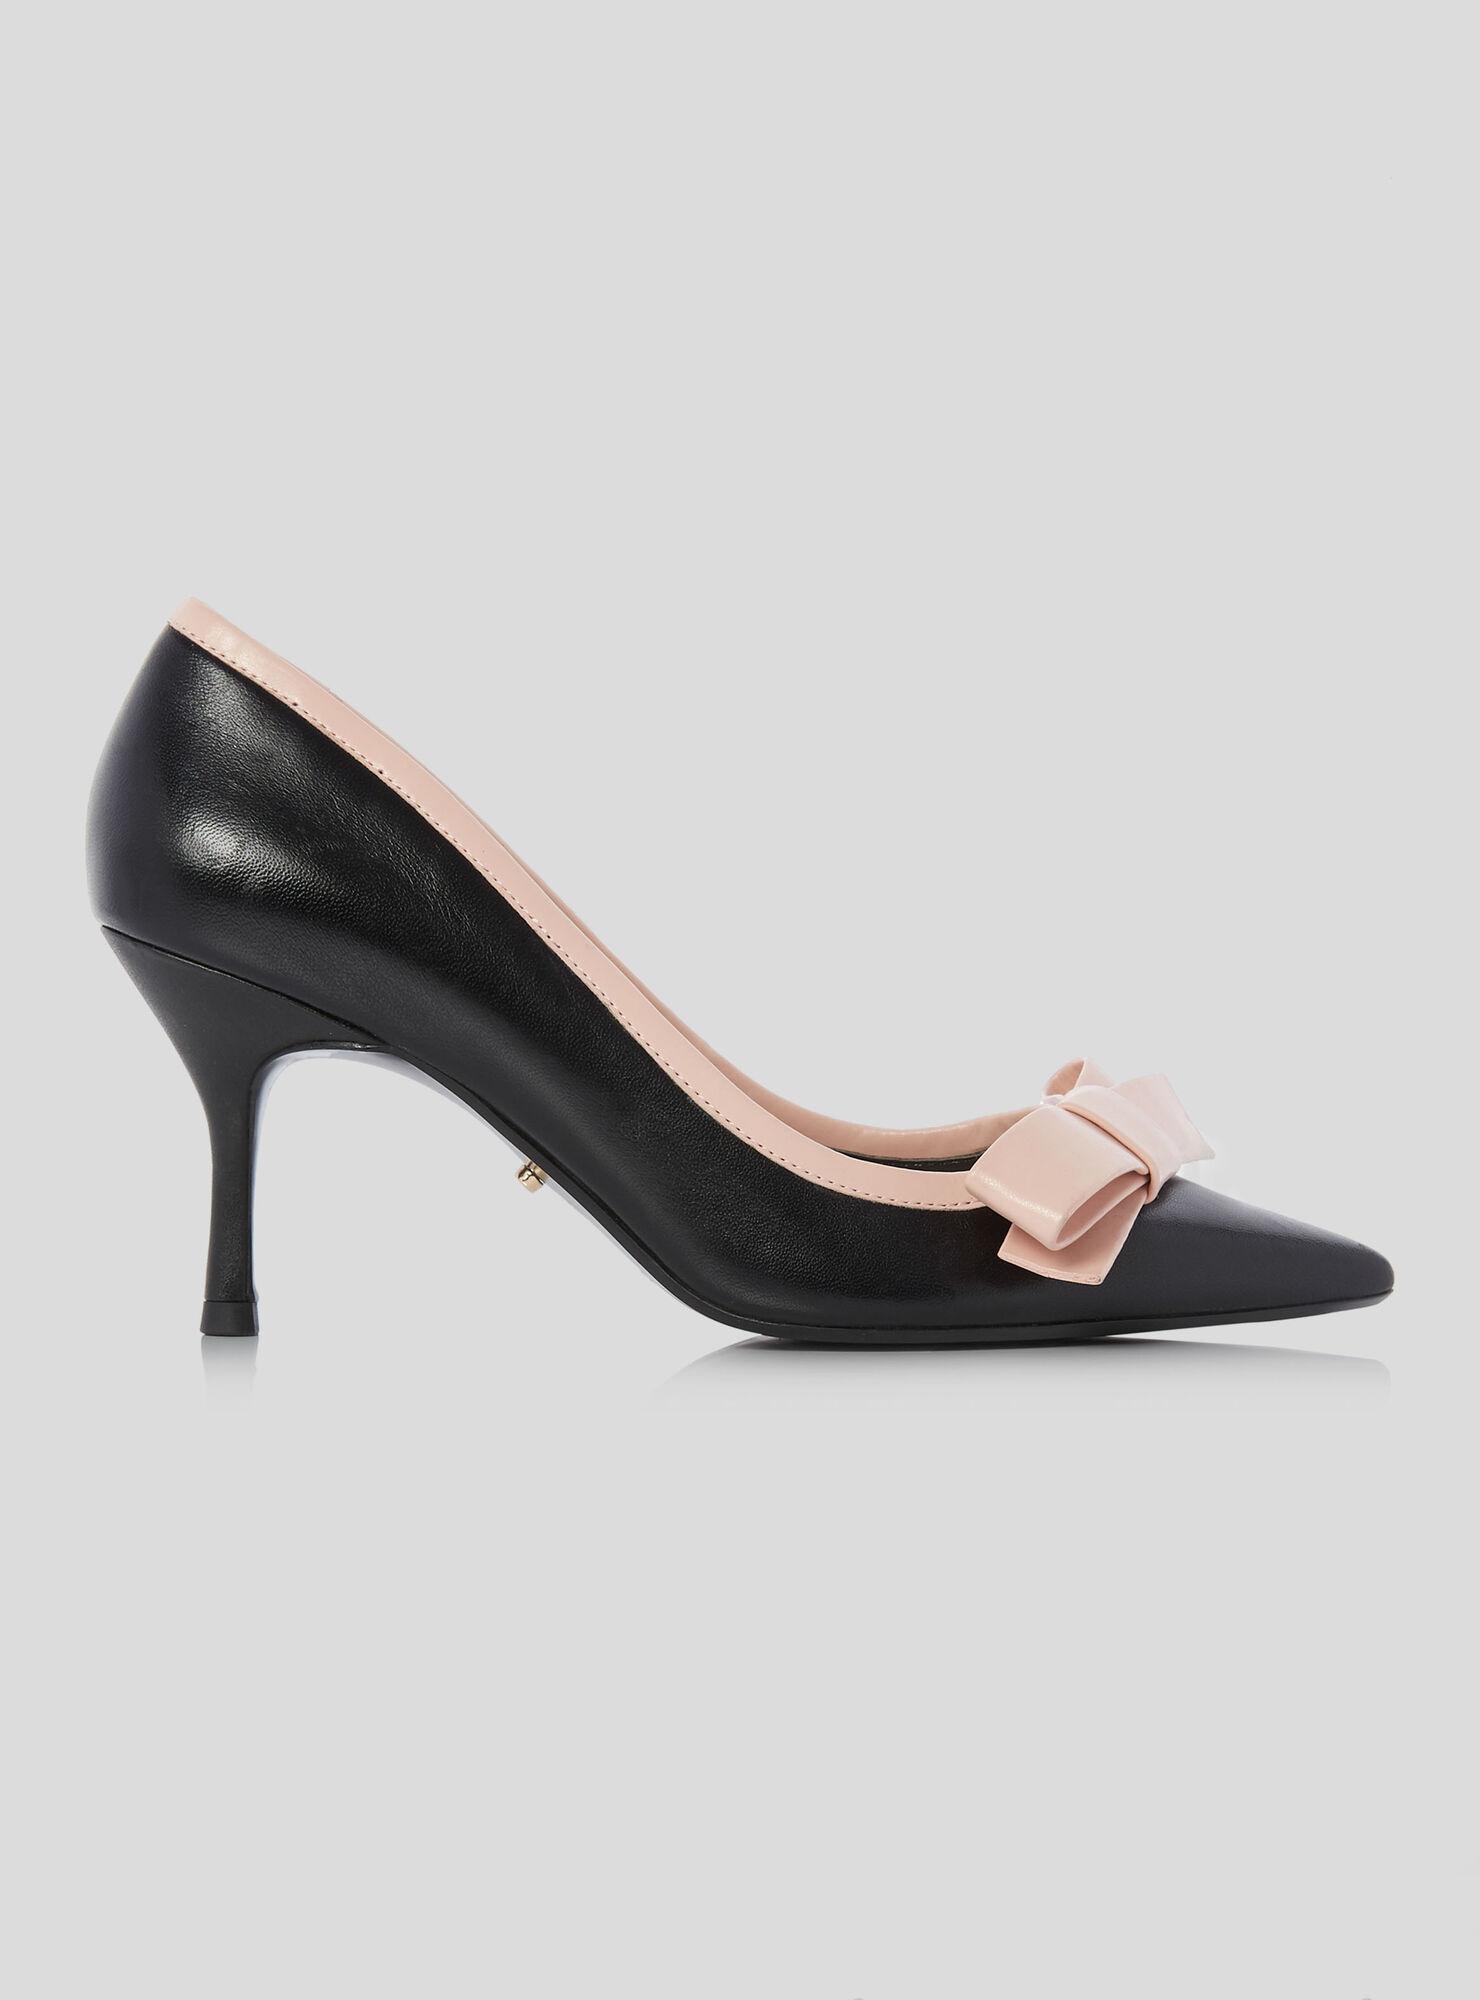 fcd04dbe27e Zapato de Vestir Dune Besee en Zapatos Mujer | Paris